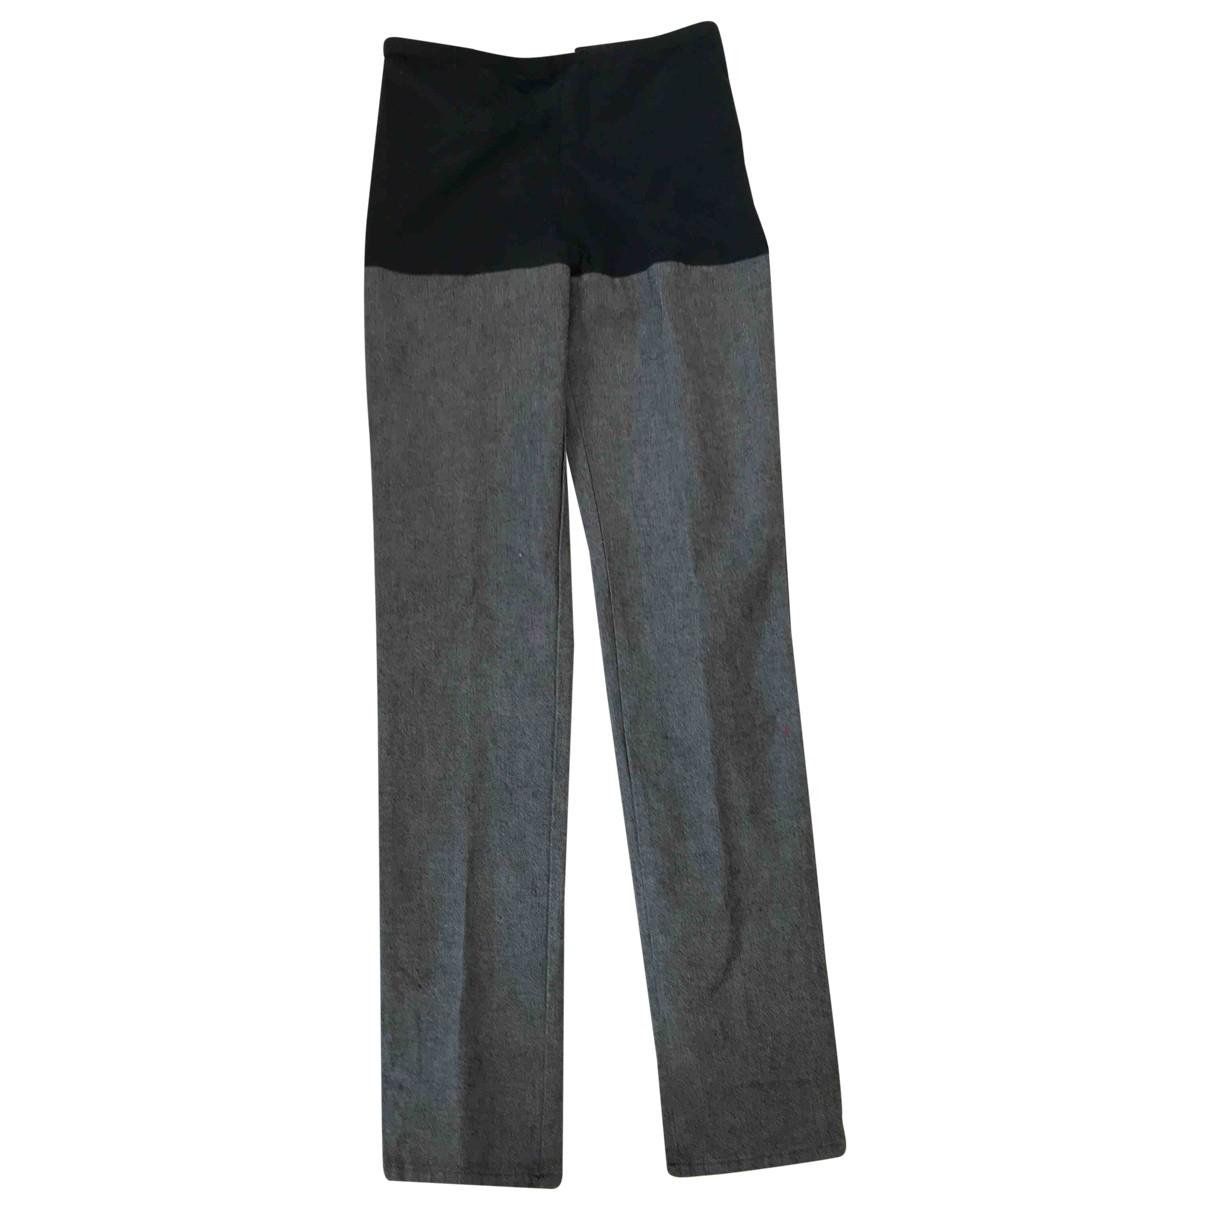 Maison Martin Margiela \N Black Denim - Jeans Trousers for Women 42 IT